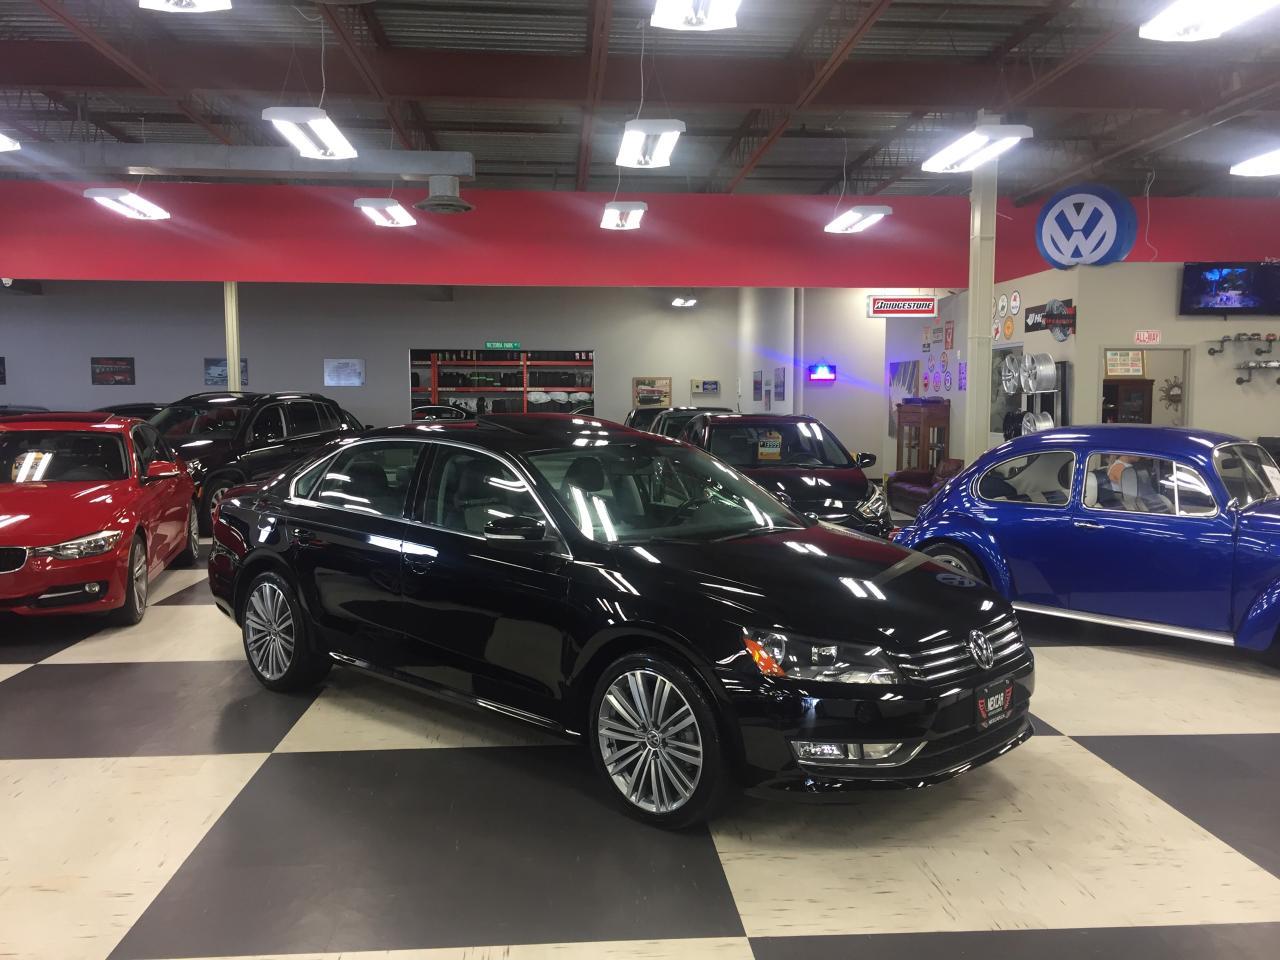 2015 Volkswagen Passat 1.8TSI COMFORTLINE AUT0 2 TONE LEATHER SUNROOF 34K